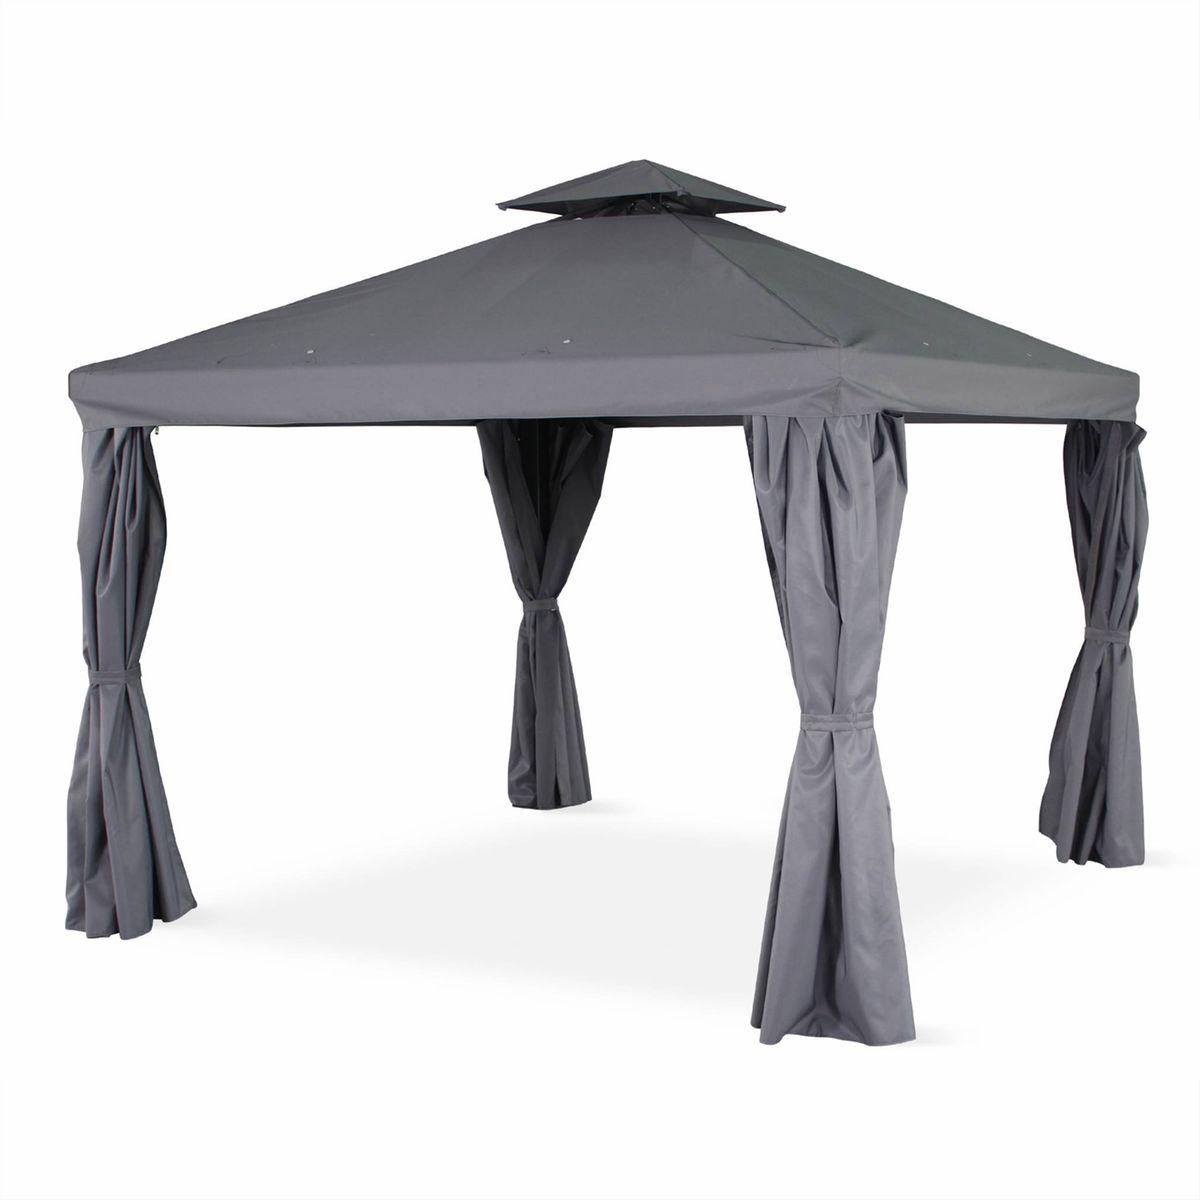 Systeme De Rideau Coulissant tente de jardin, pergola aluminium 3x3m divodorum , avec